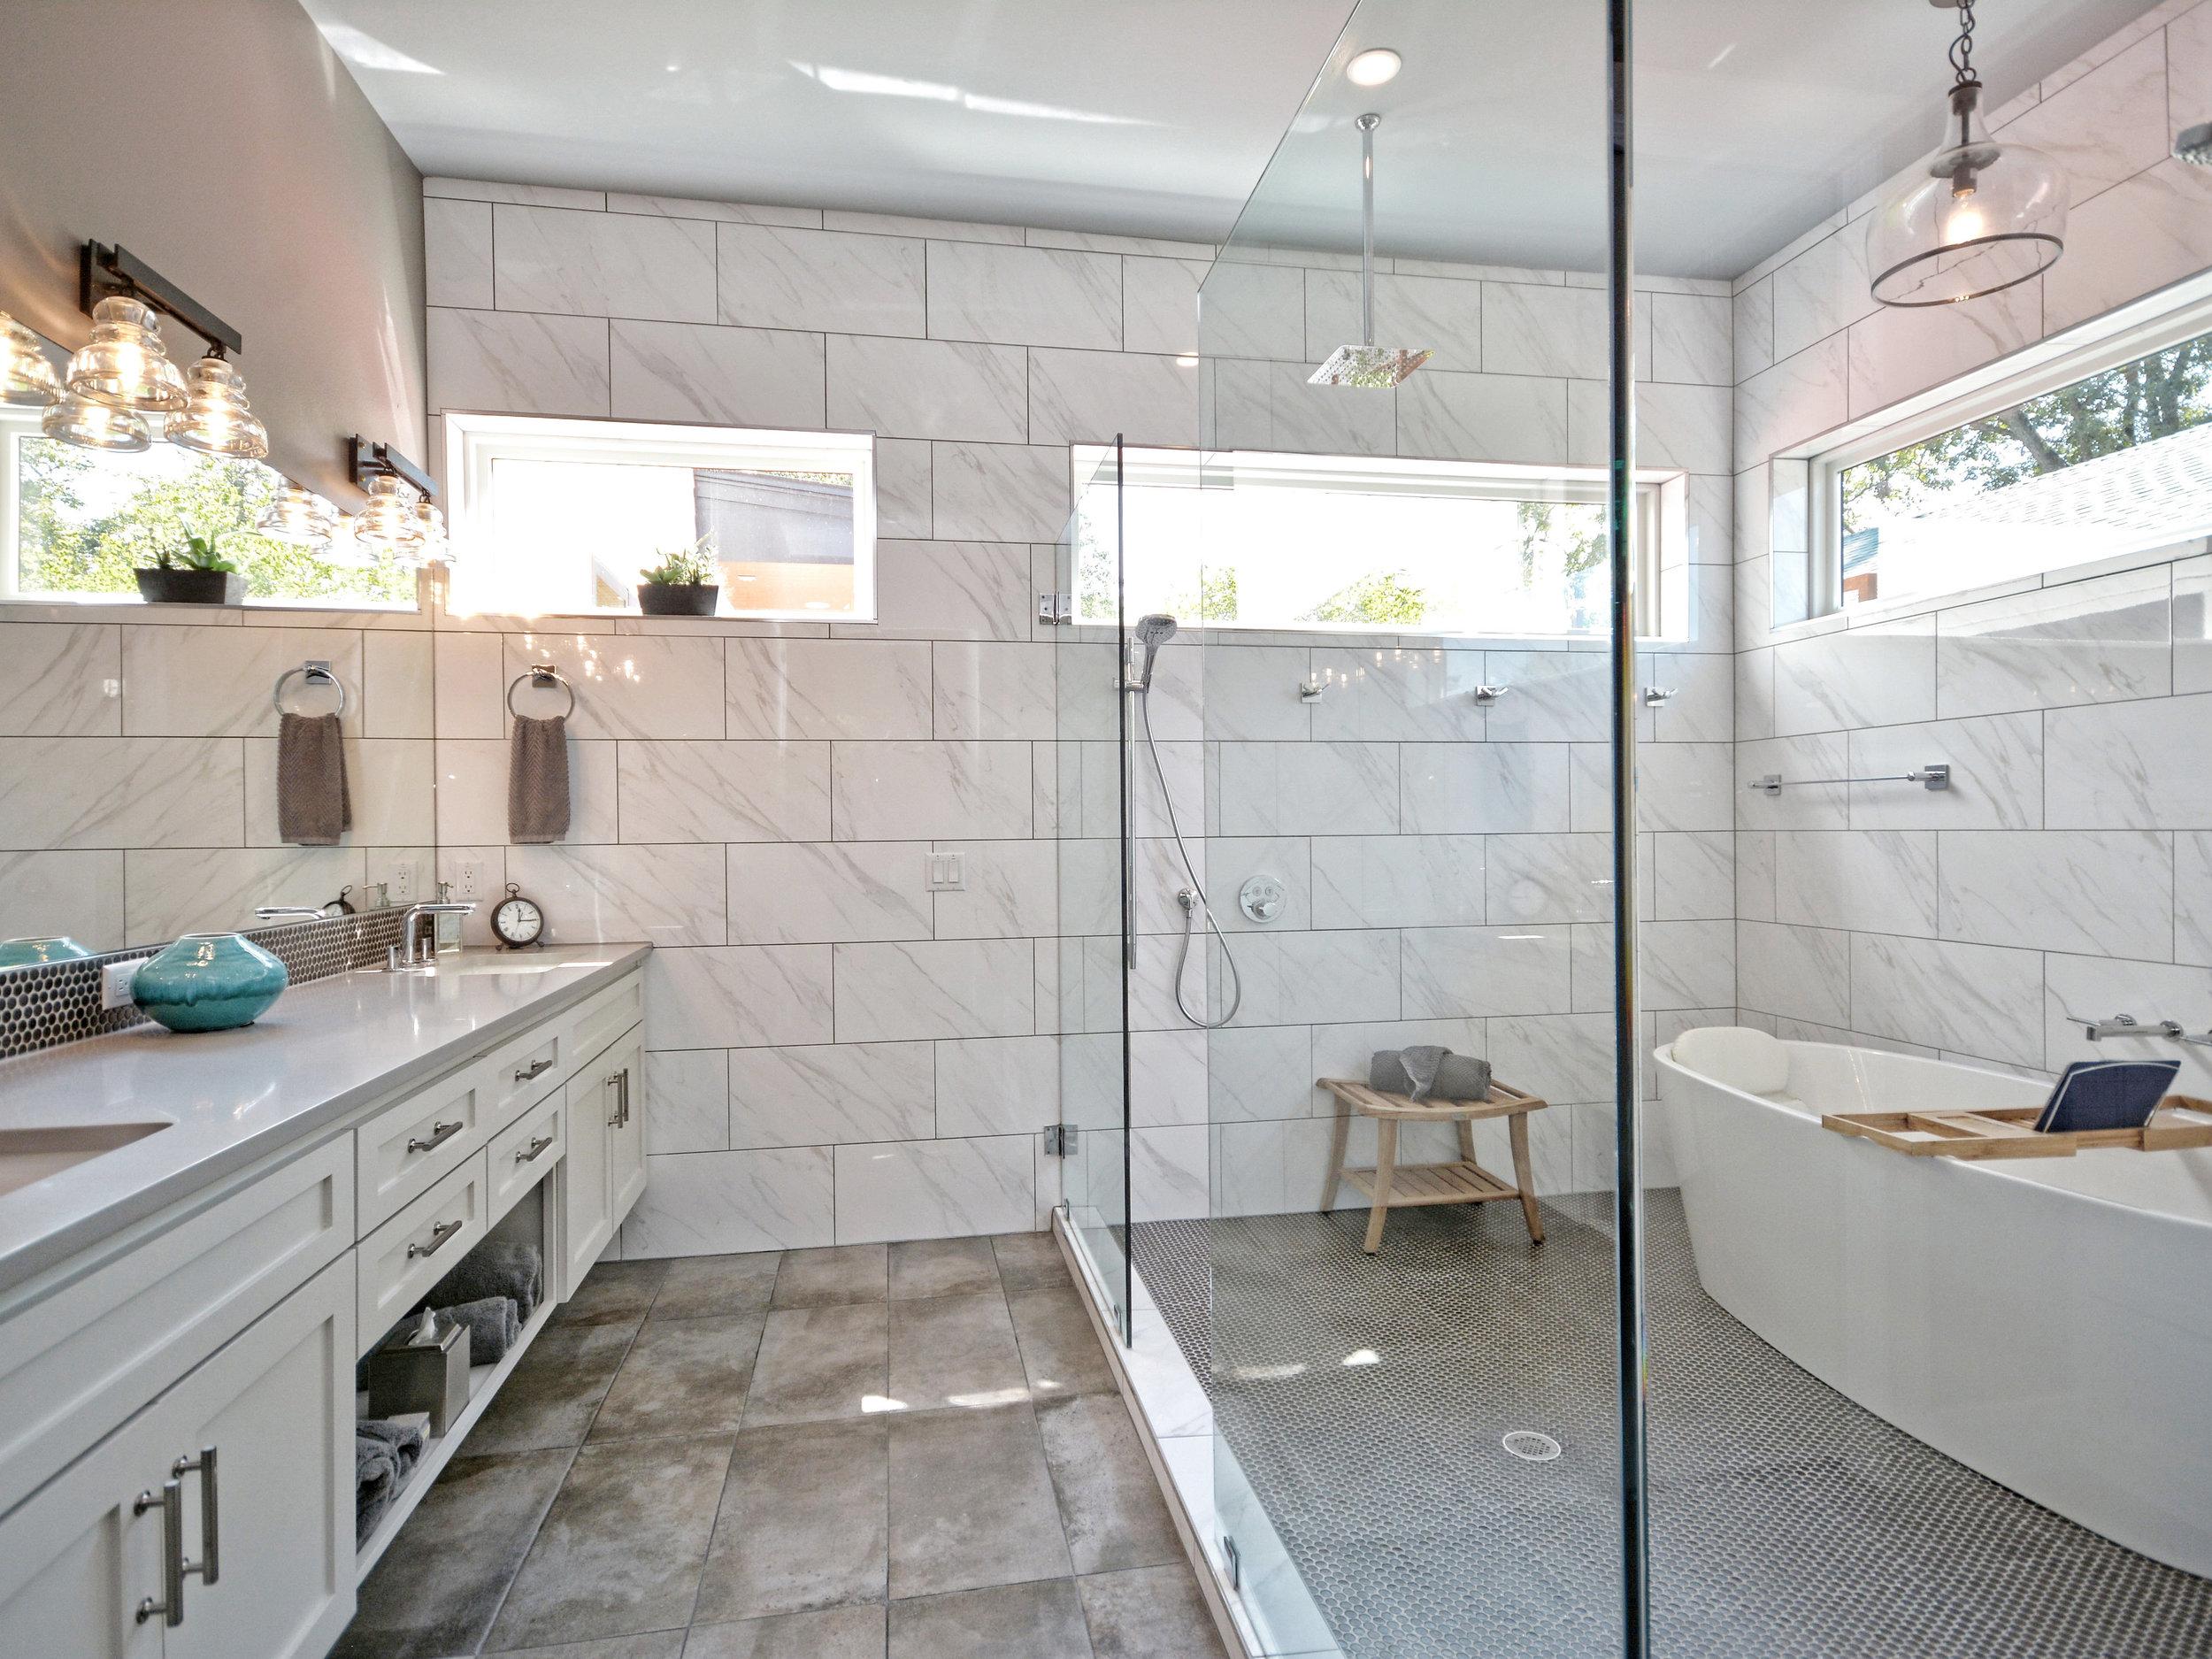 020_Master Bathroom .jpg